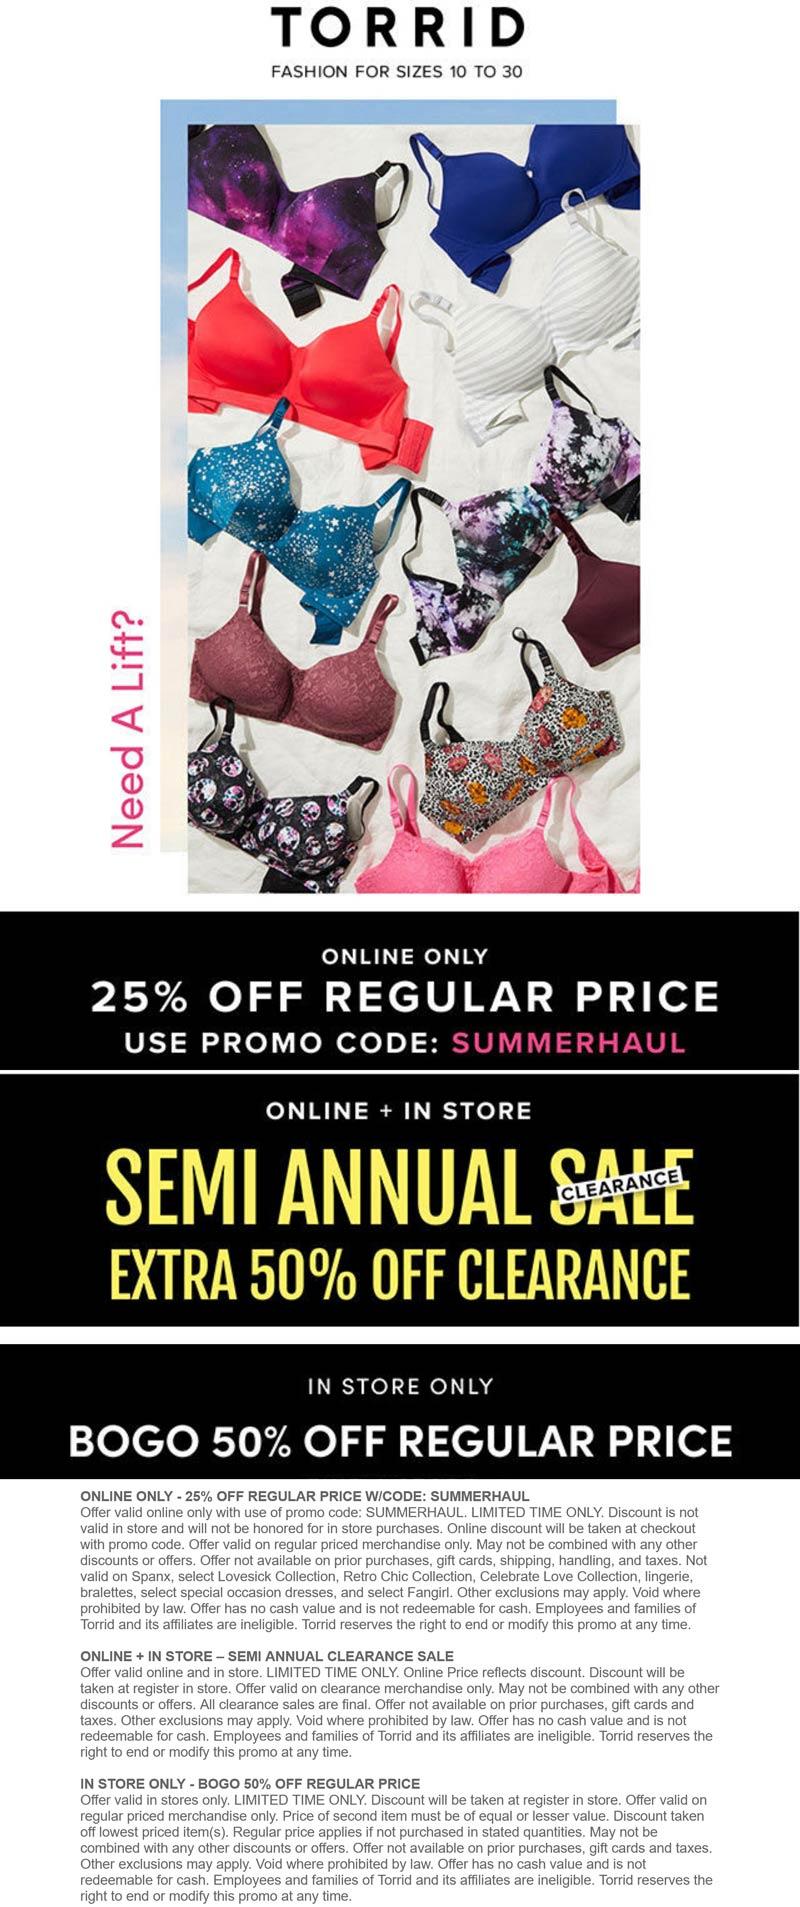 Torrid stores Coupon  Second item 50% off at Torrid, or 25% off online via promo code SUMMERHAUL #torrid